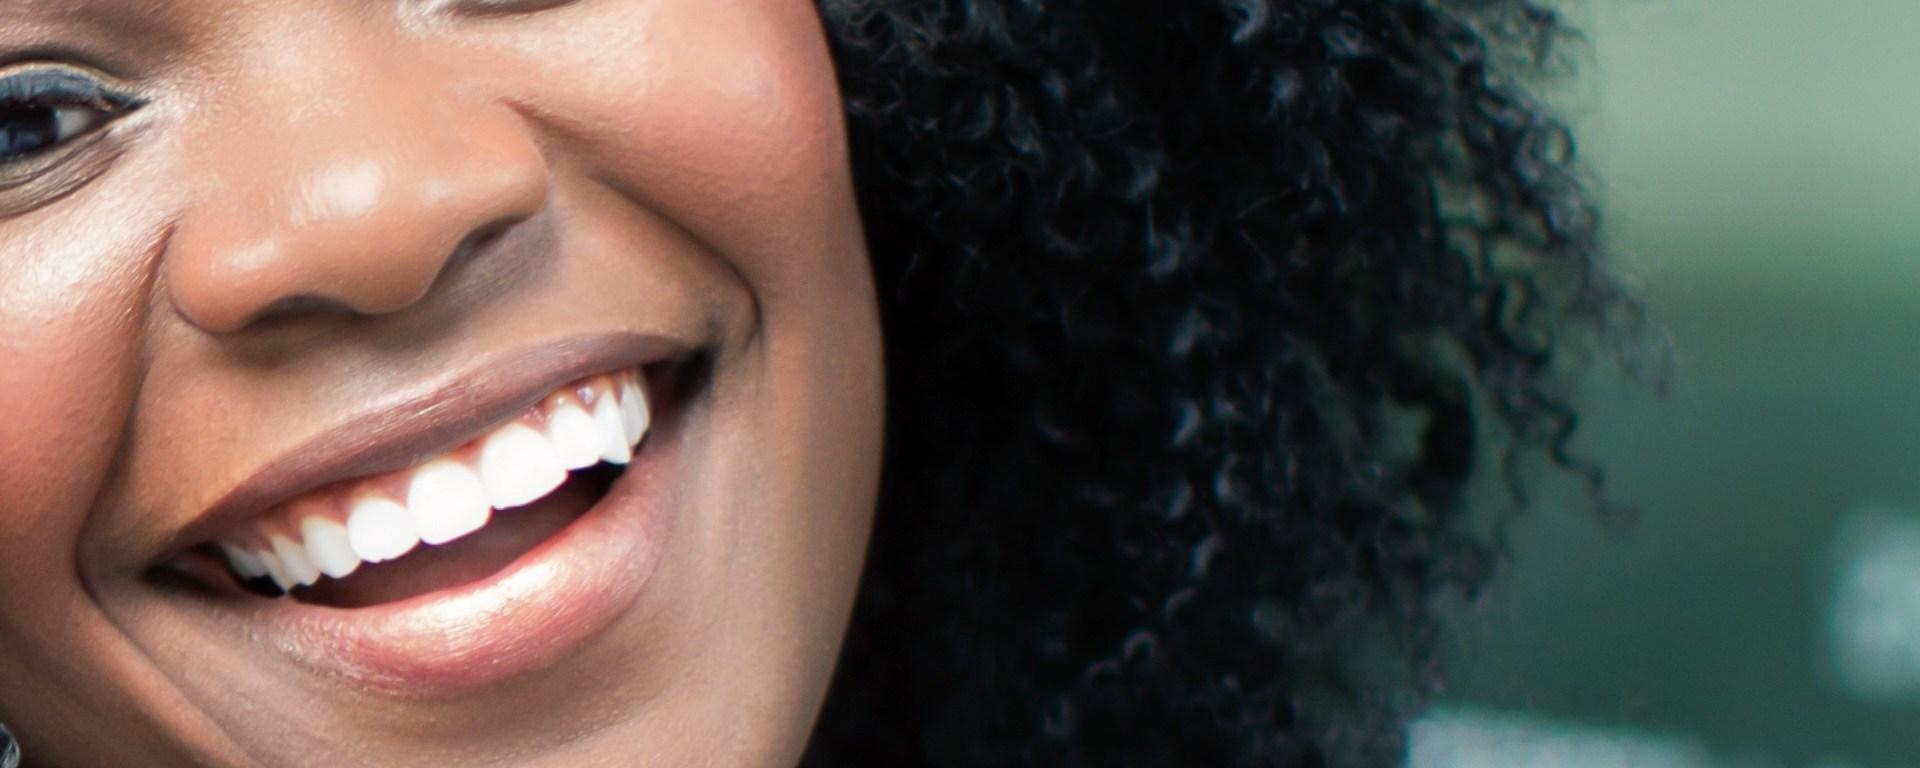 study dental hygiene in connecticut